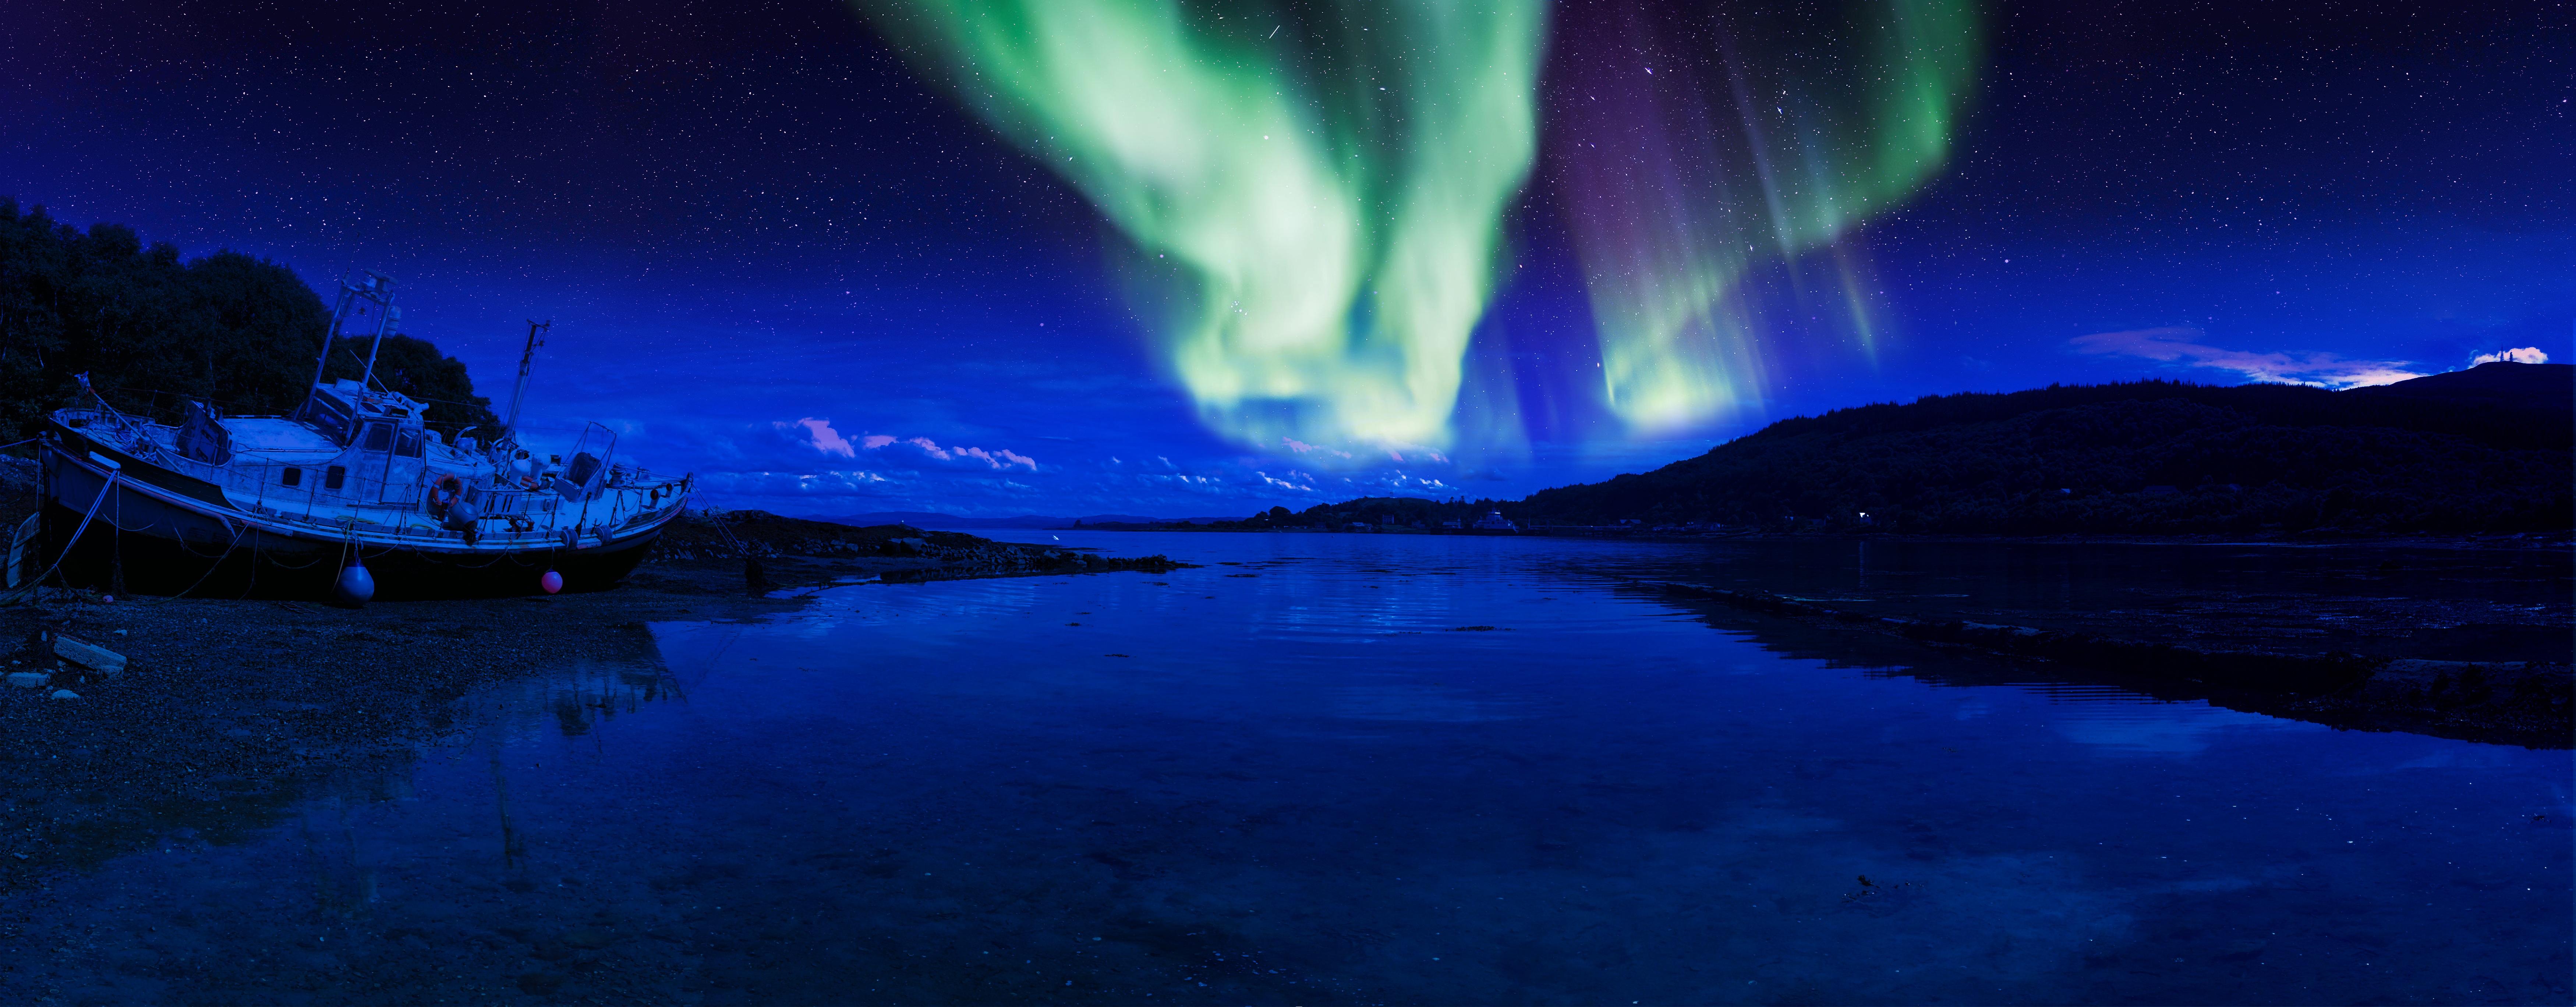 Beach Night S Atmosphere Aurora